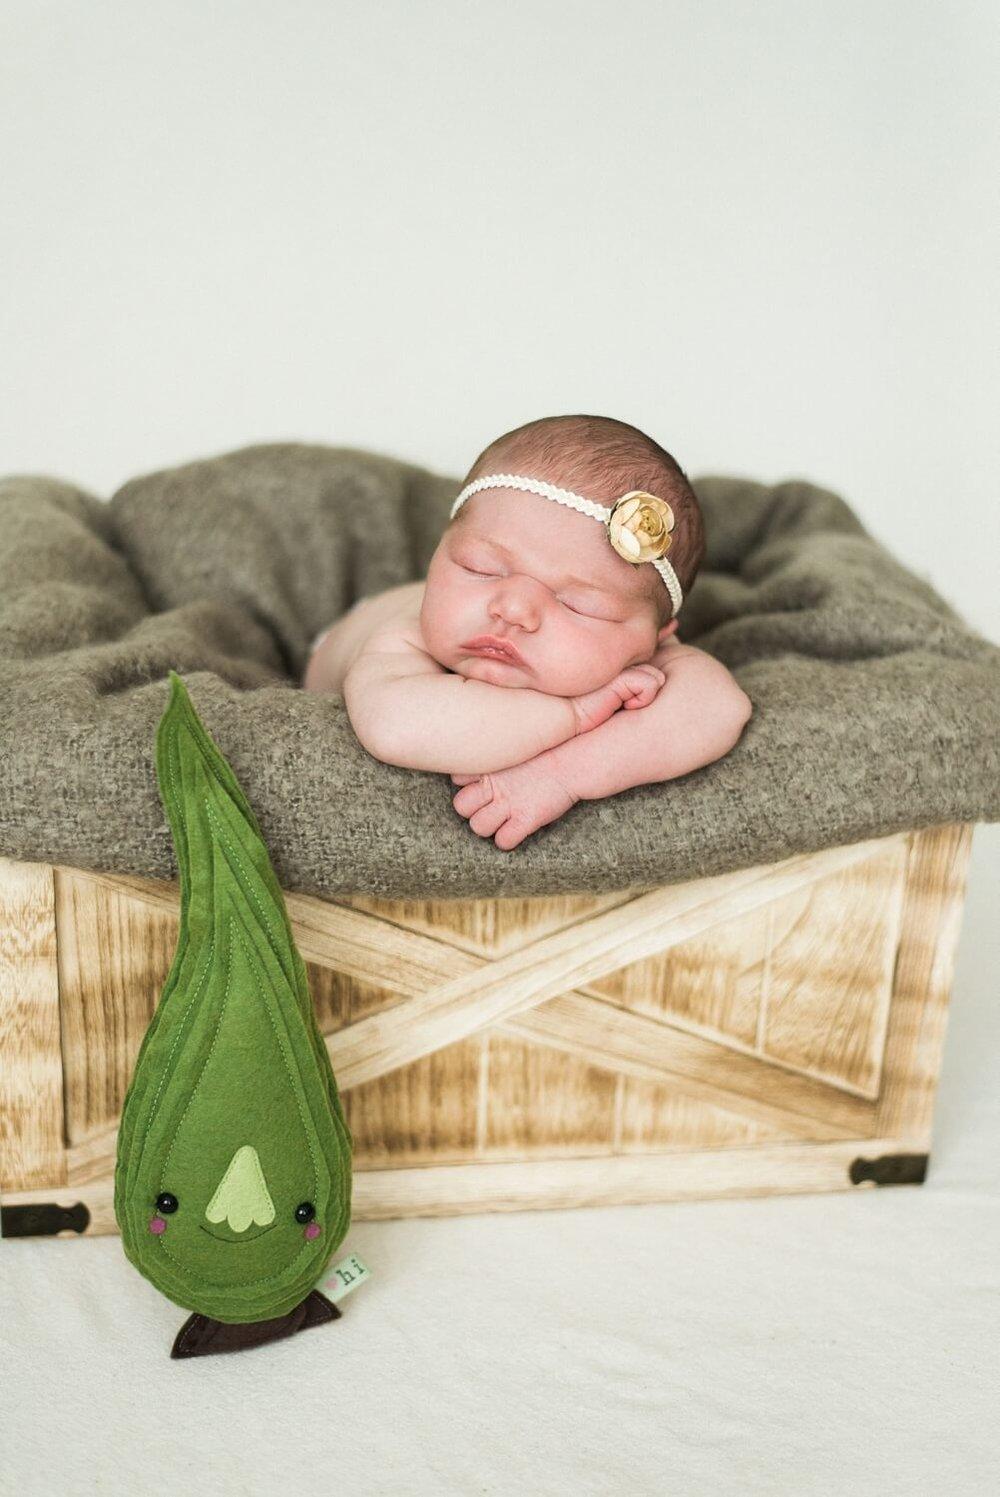 best-portland-oregon-newborn-photographer-sleeping-baby-girl-with-flower-headband-shelley-marie-photography-45.jpg